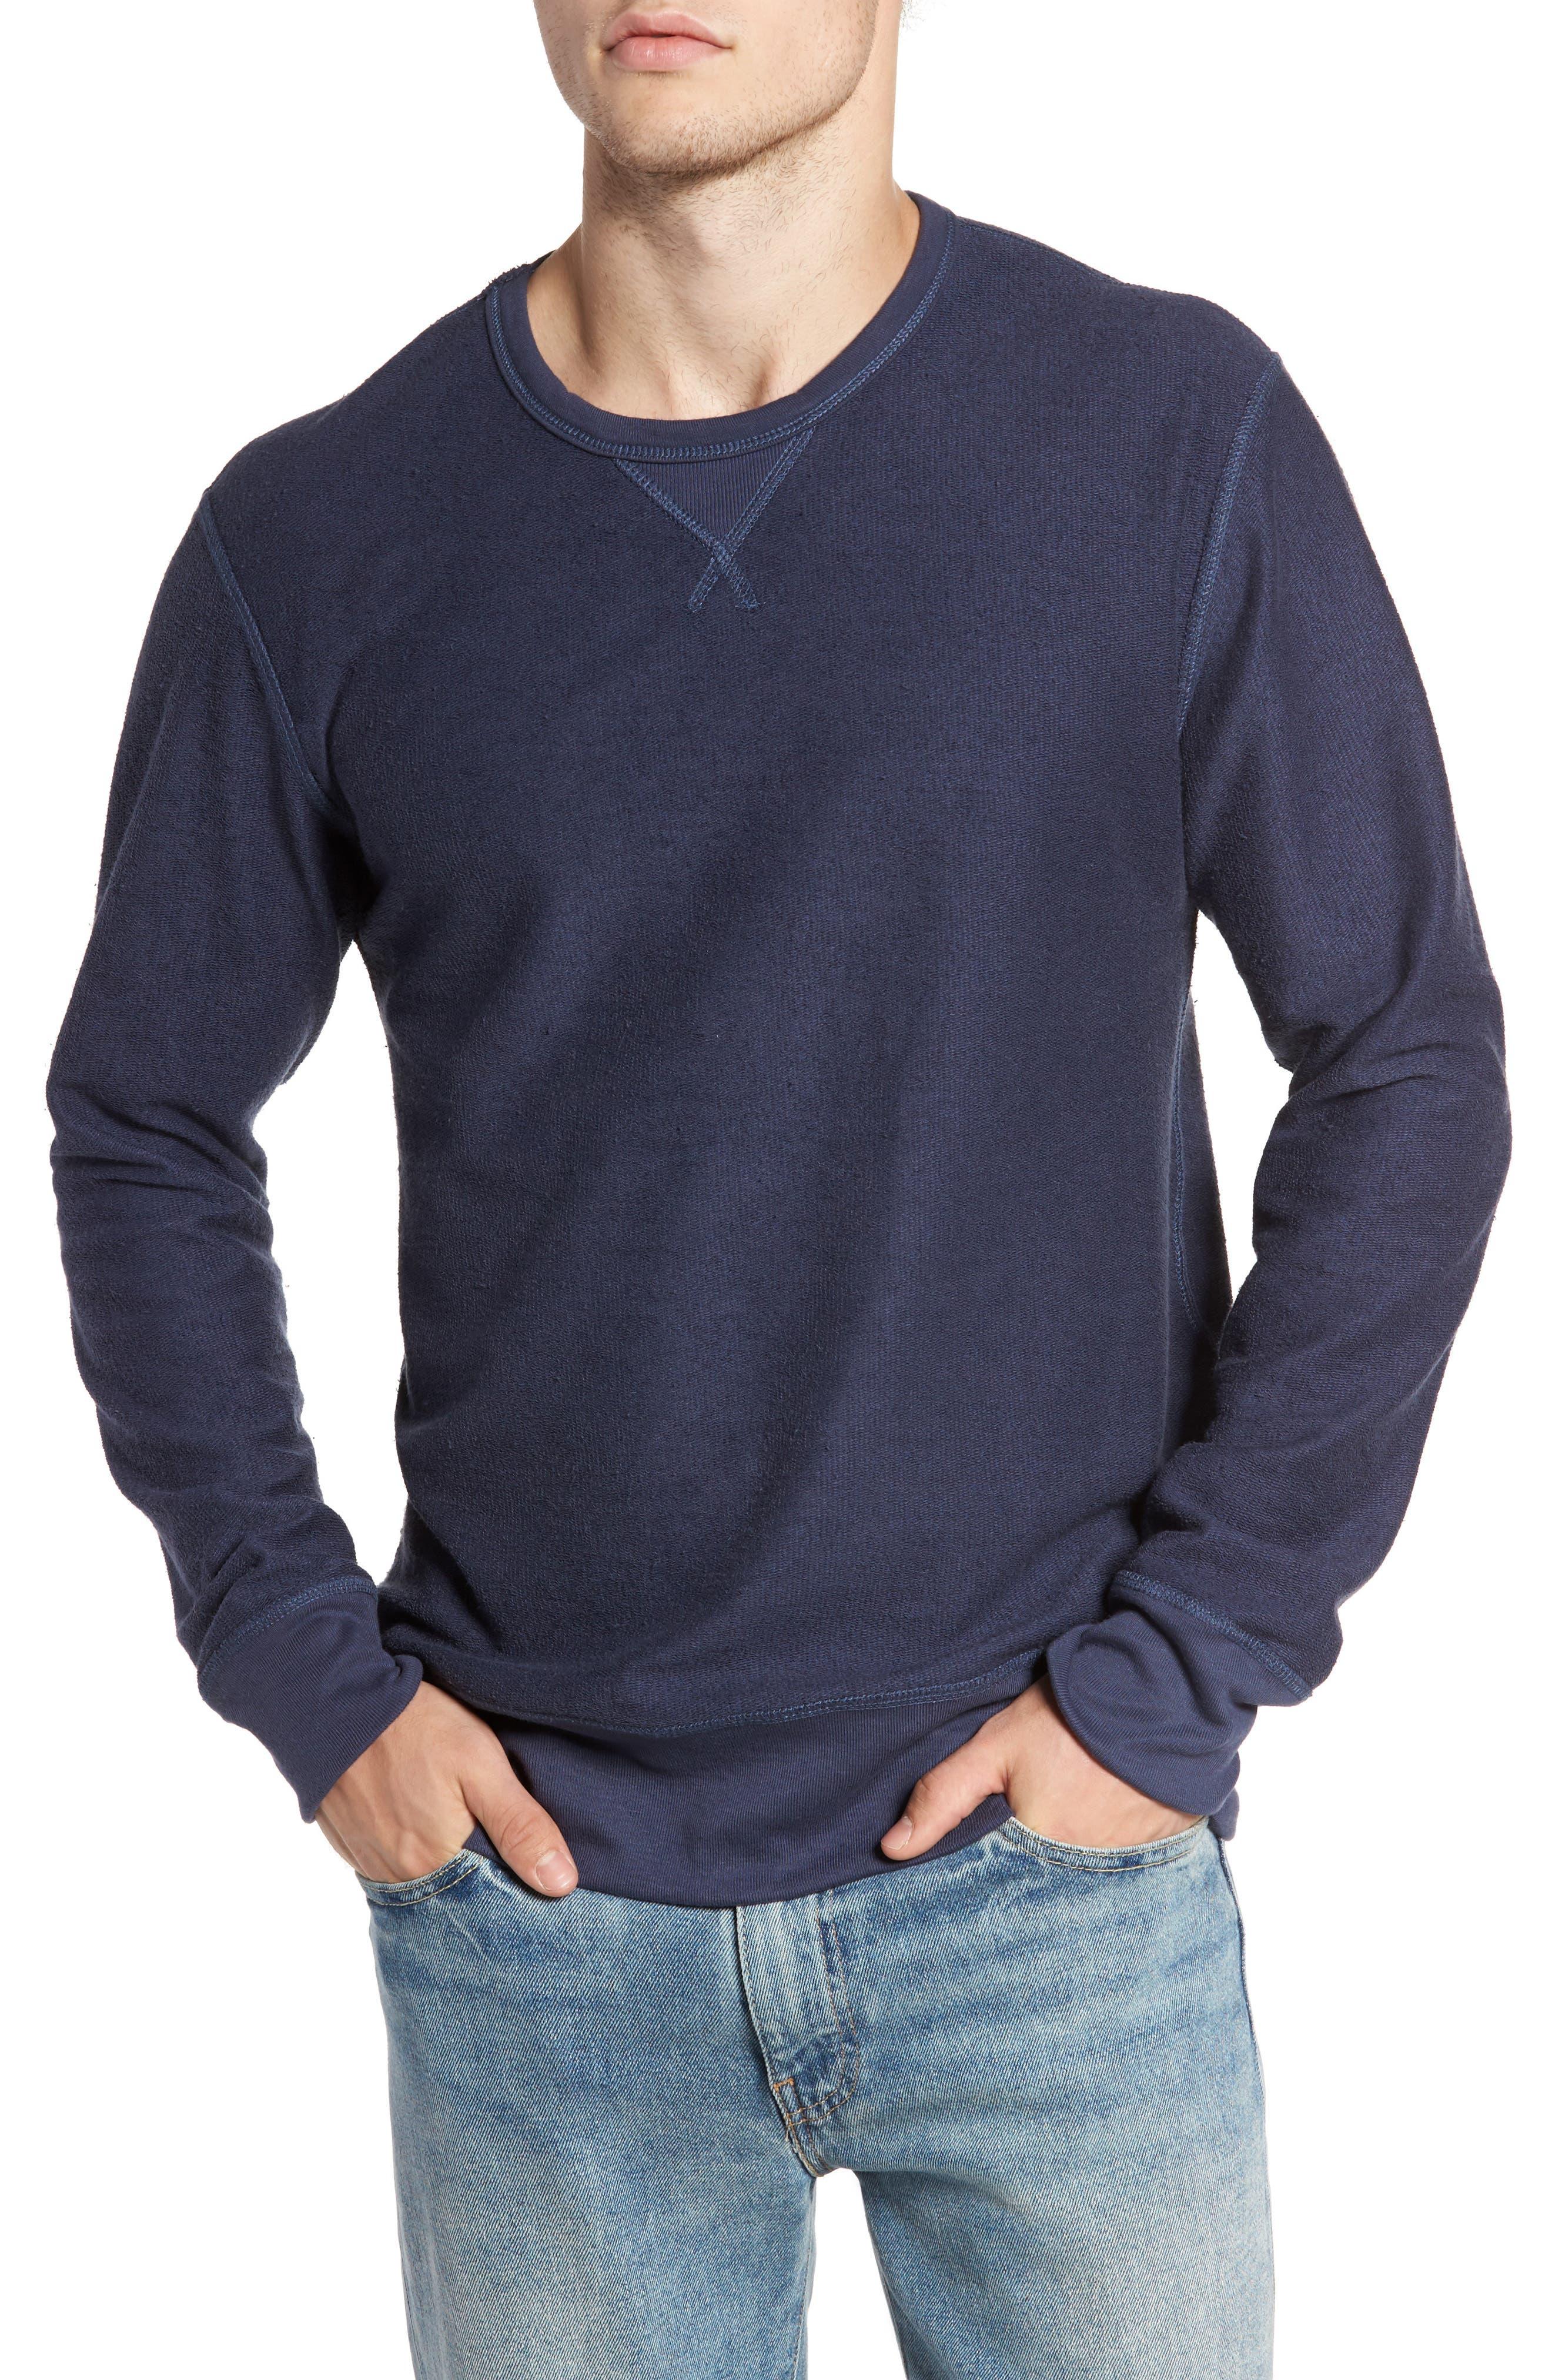 B-Side Reversible Crewneck Sweatshirt,                             Alternate thumbnail 26, color,